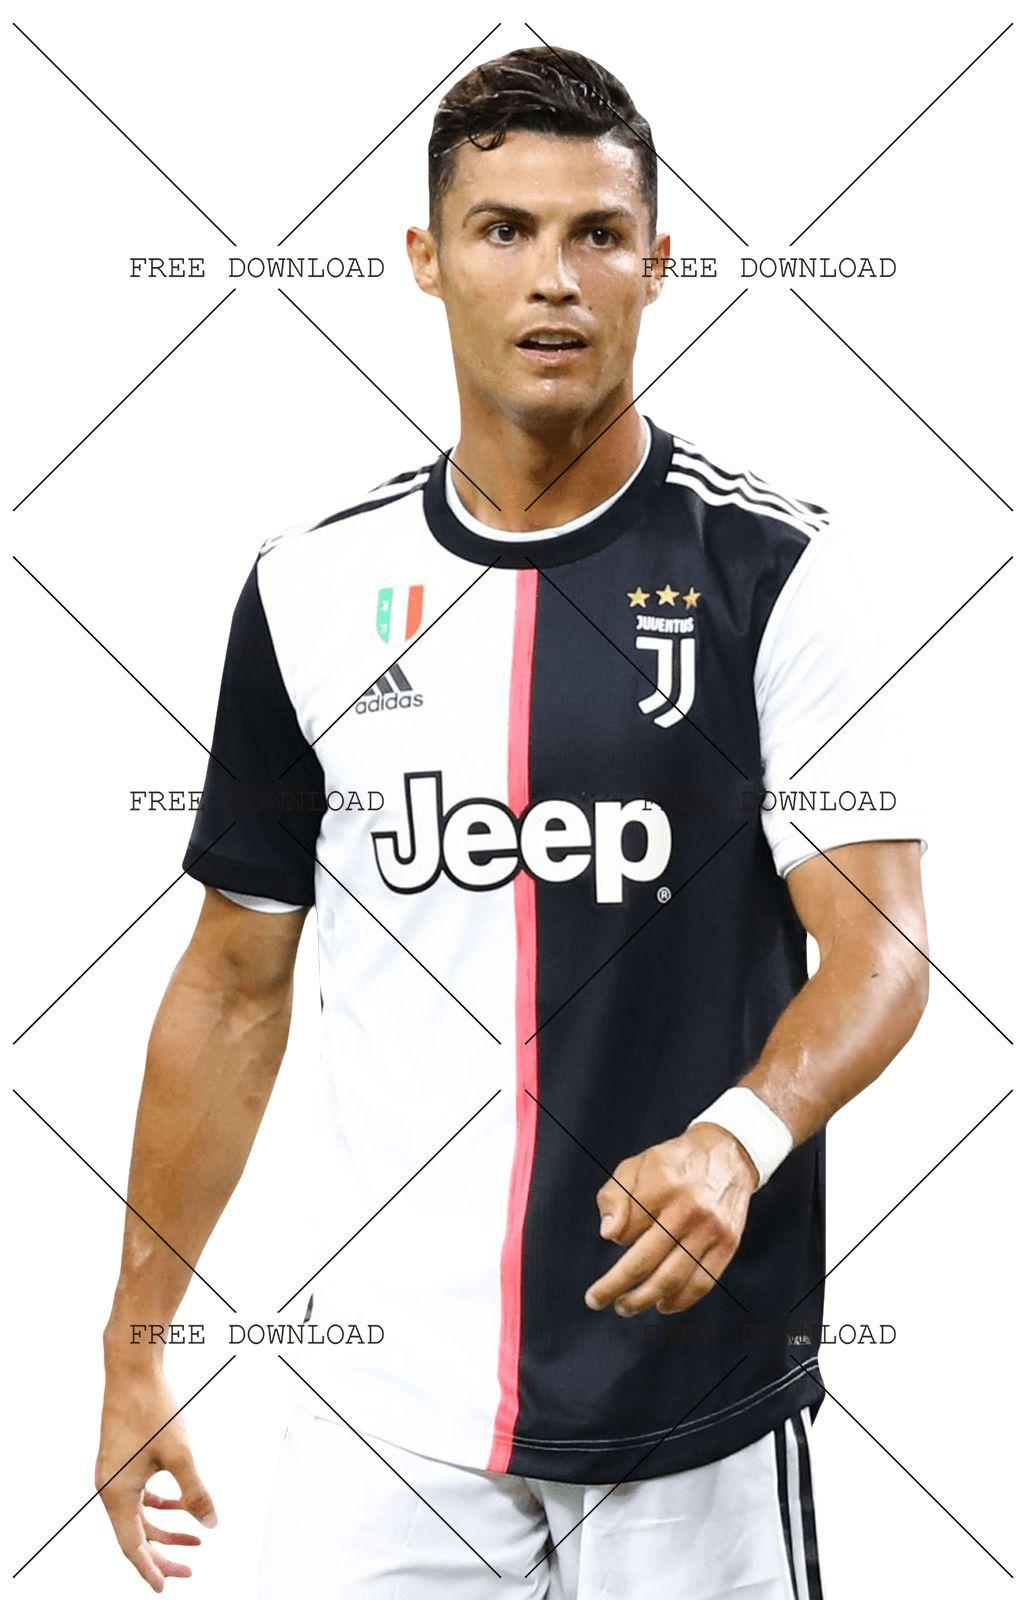 Cristiano Ronaldo Png Image With Transparent Background Ronaldo Cristiano Ronaldo Ronaldo Juventus